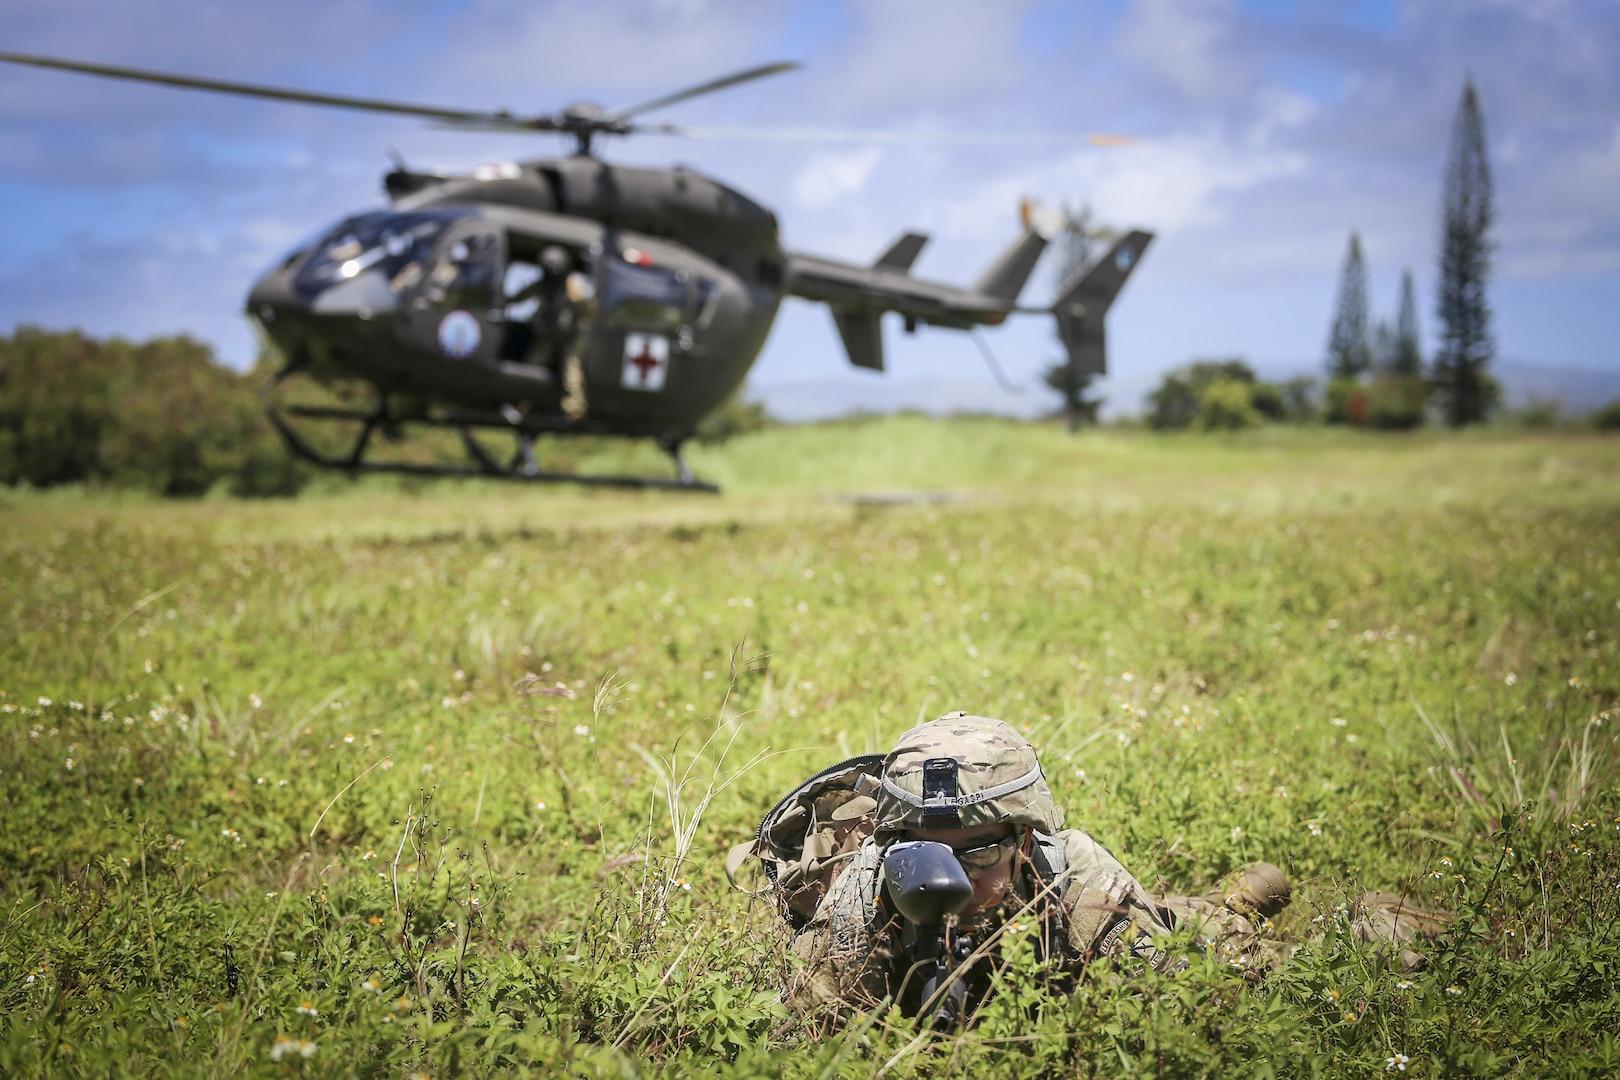 Guam National Guard, ROTC Train Together Despite COVID-19